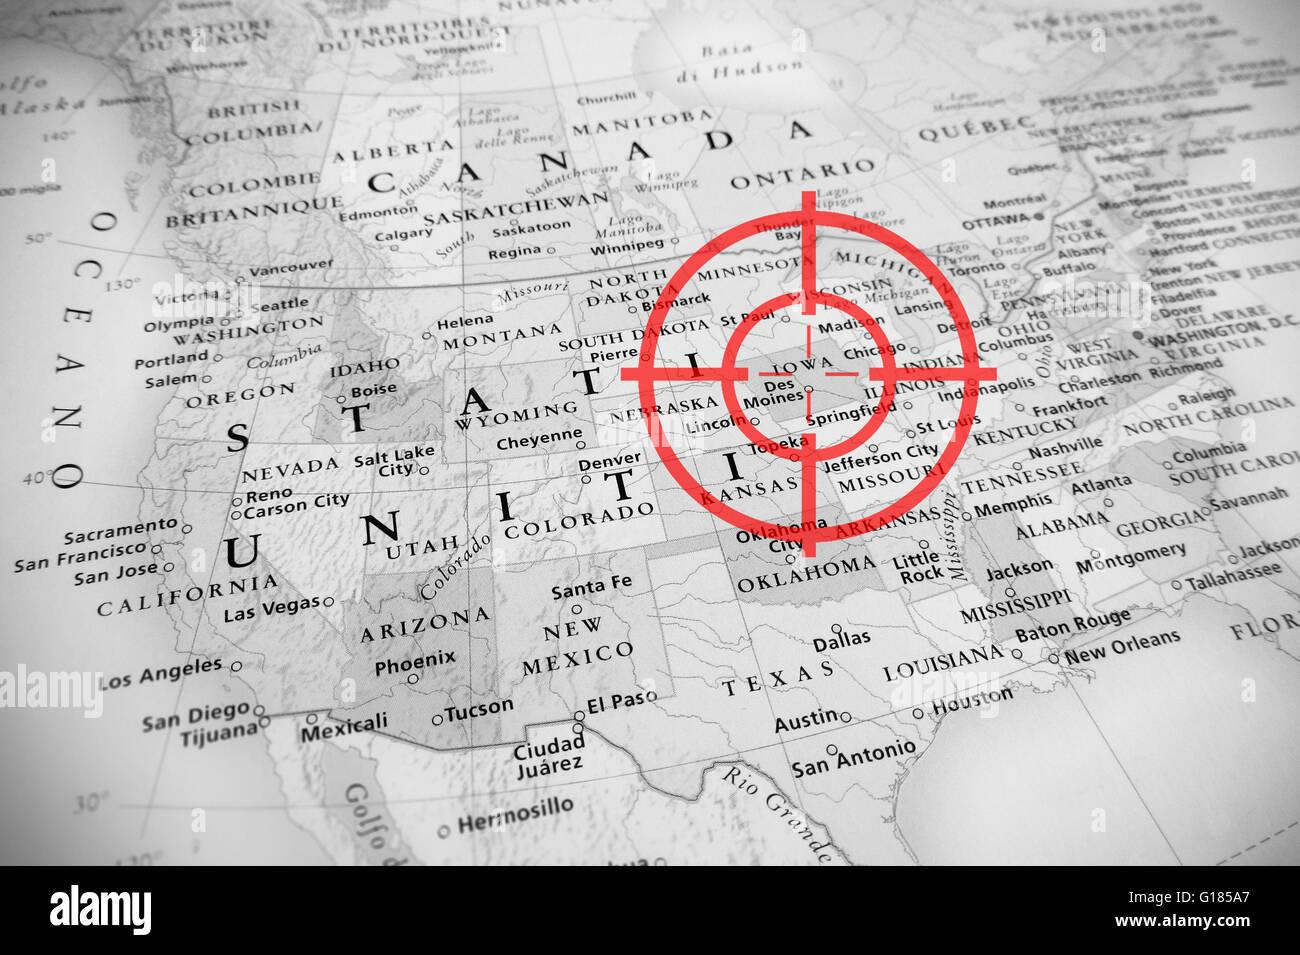 Montana Map Wyoming Idaho Utah Stock Photos Montana Map Wyoming